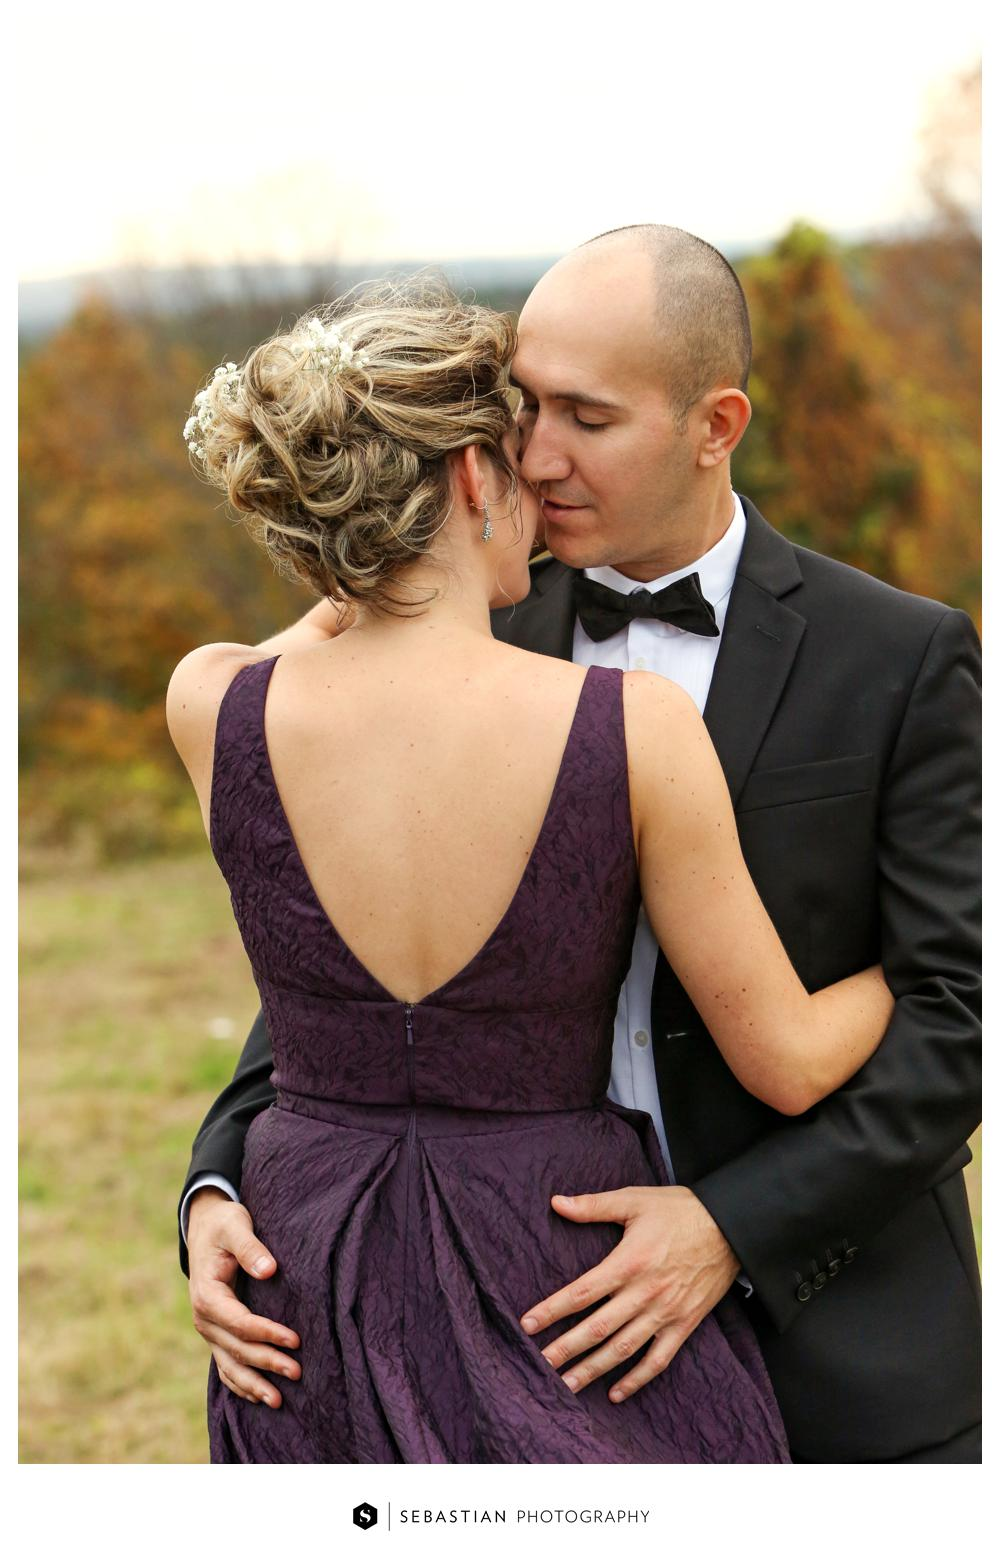 Sebastian Photography_CT Wedding Photographer_Castle Craig_CT Engagement Photographer_1013.jpg